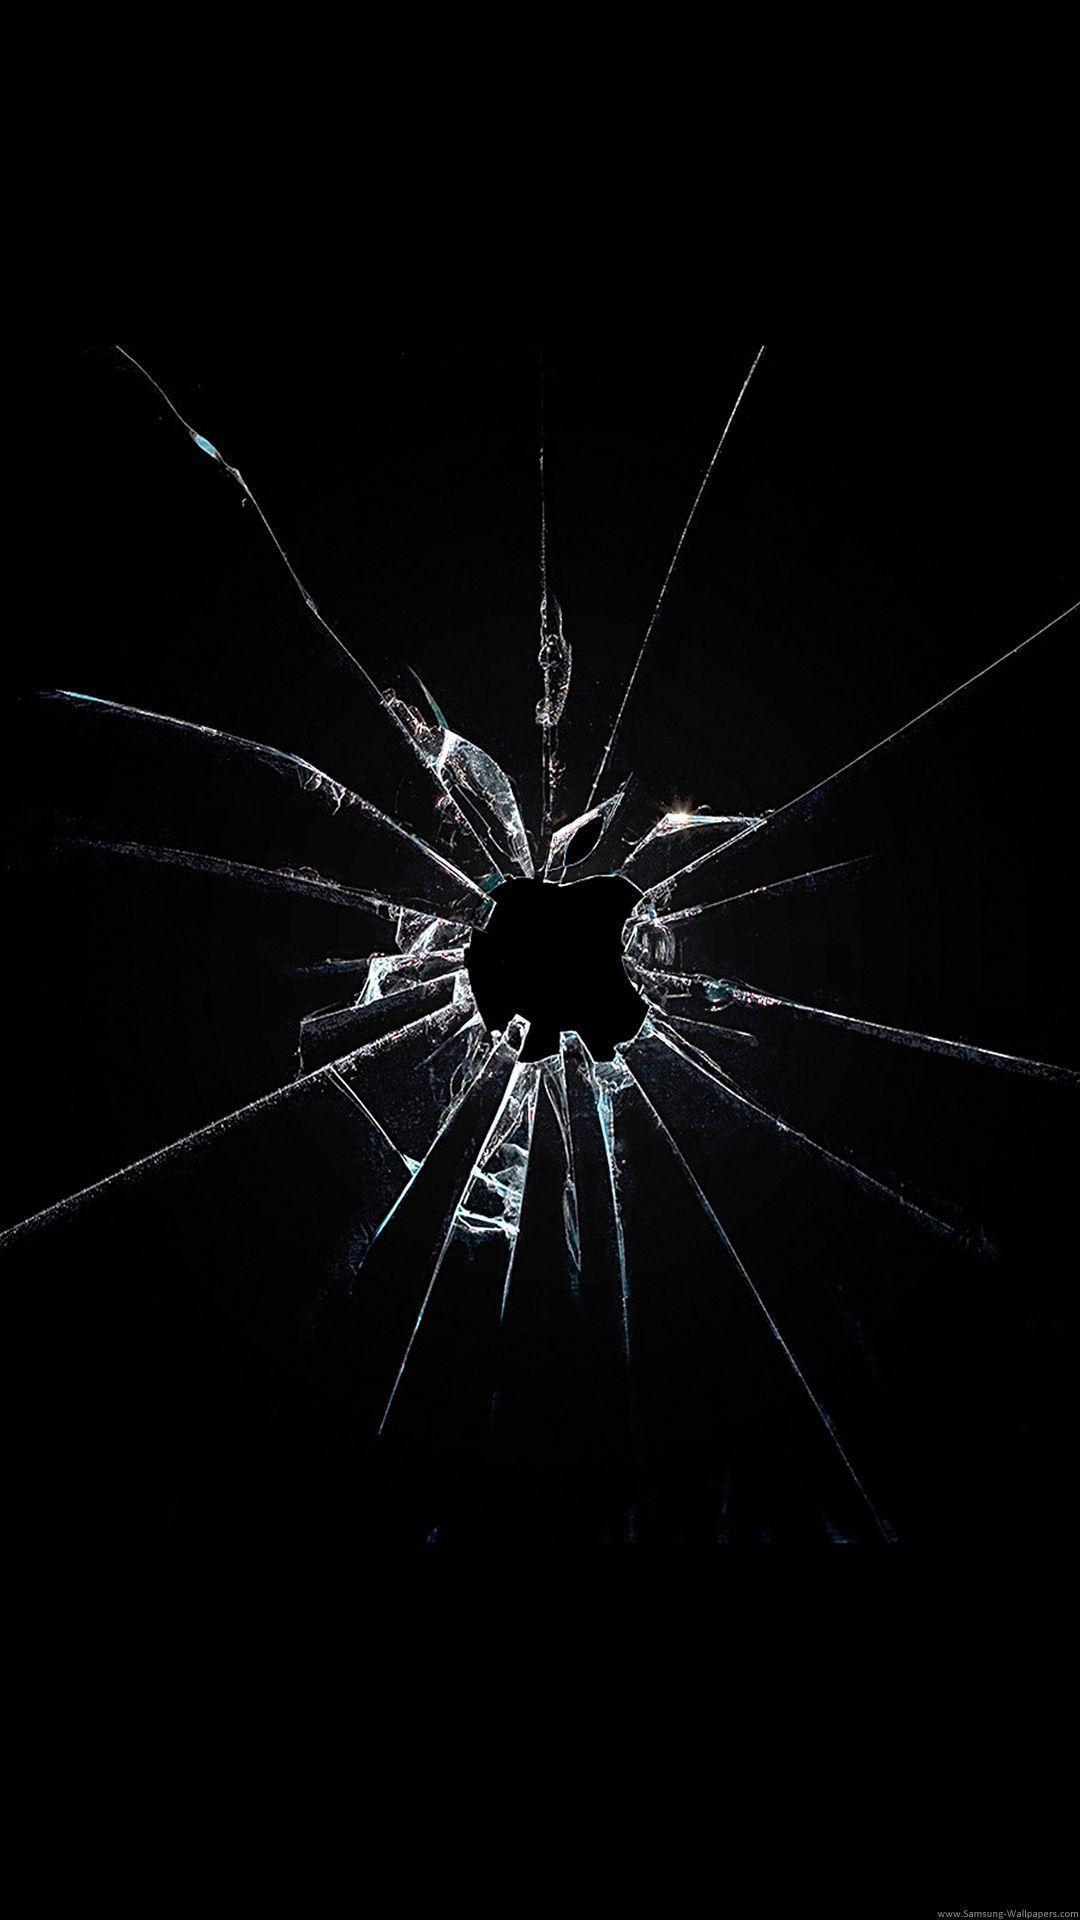 lock screen wallpaper black #lockscreenwallpaper